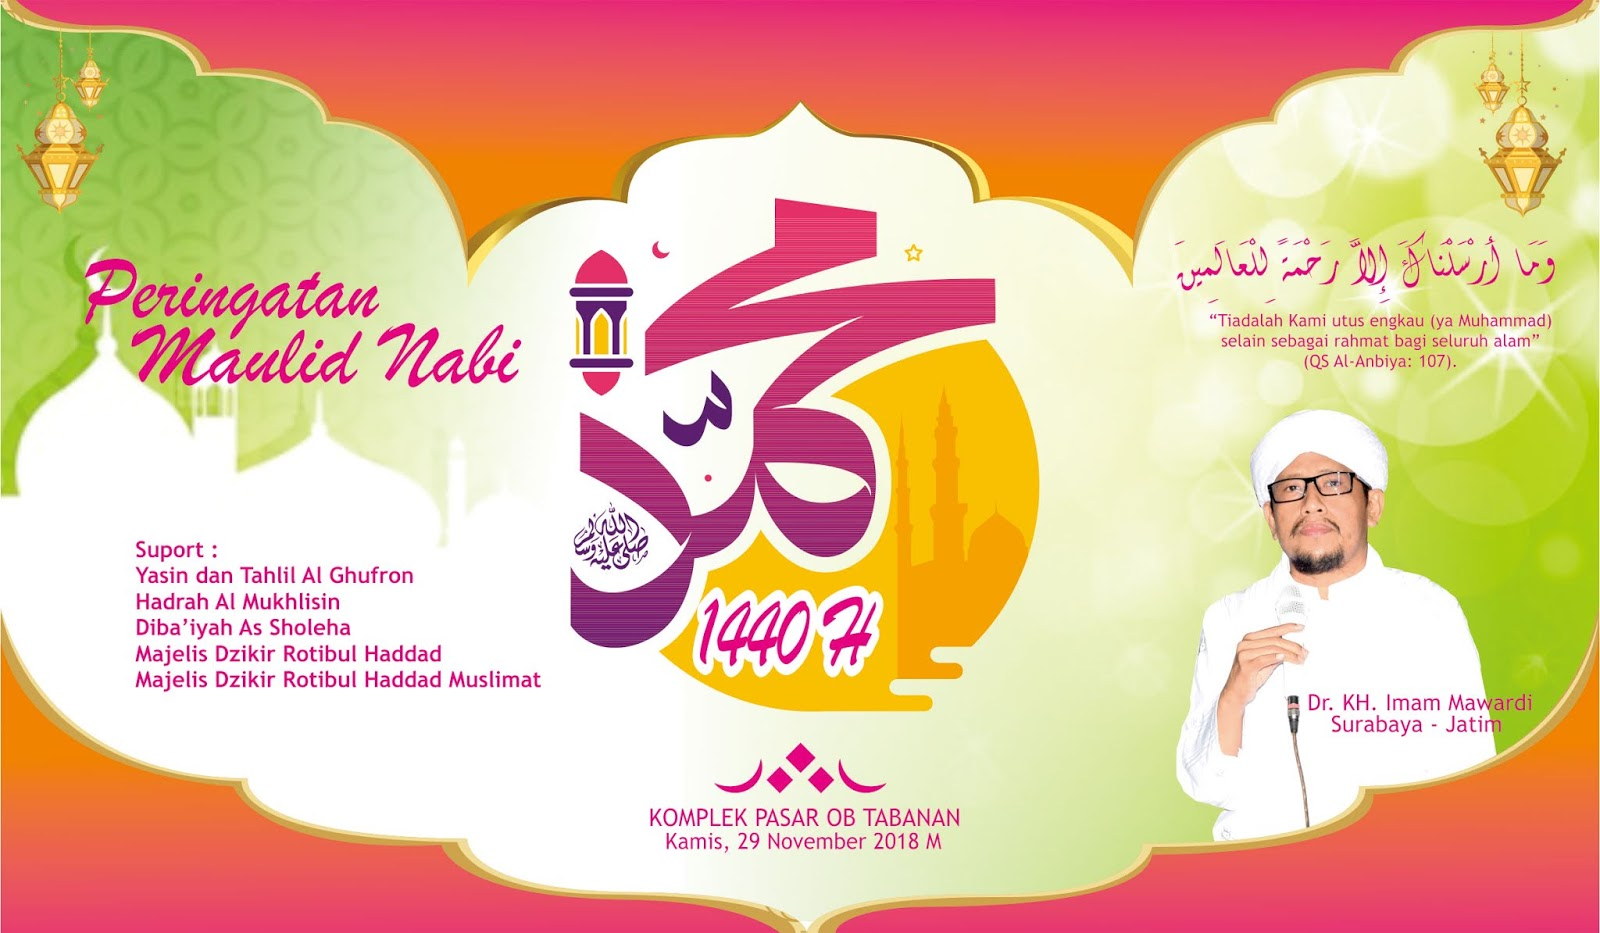 Download Desain Spanduk Format Cdr 2019 Fandi Film